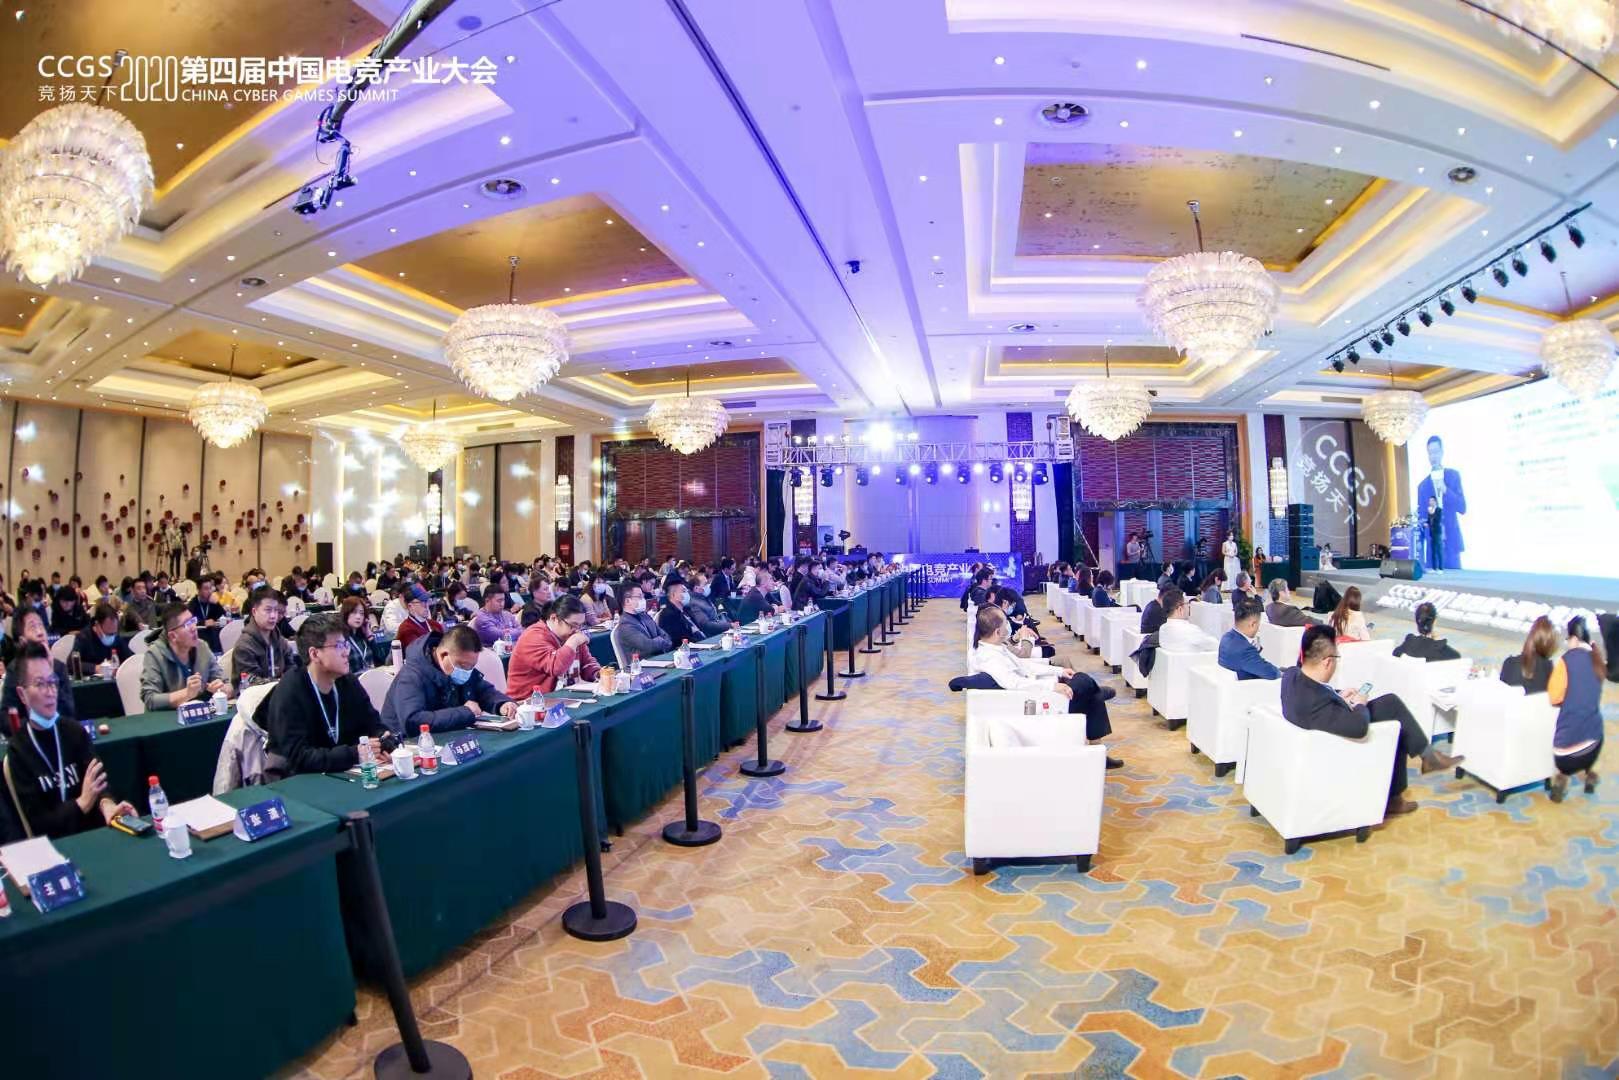 2020 China Cyber Games Summit kicks off